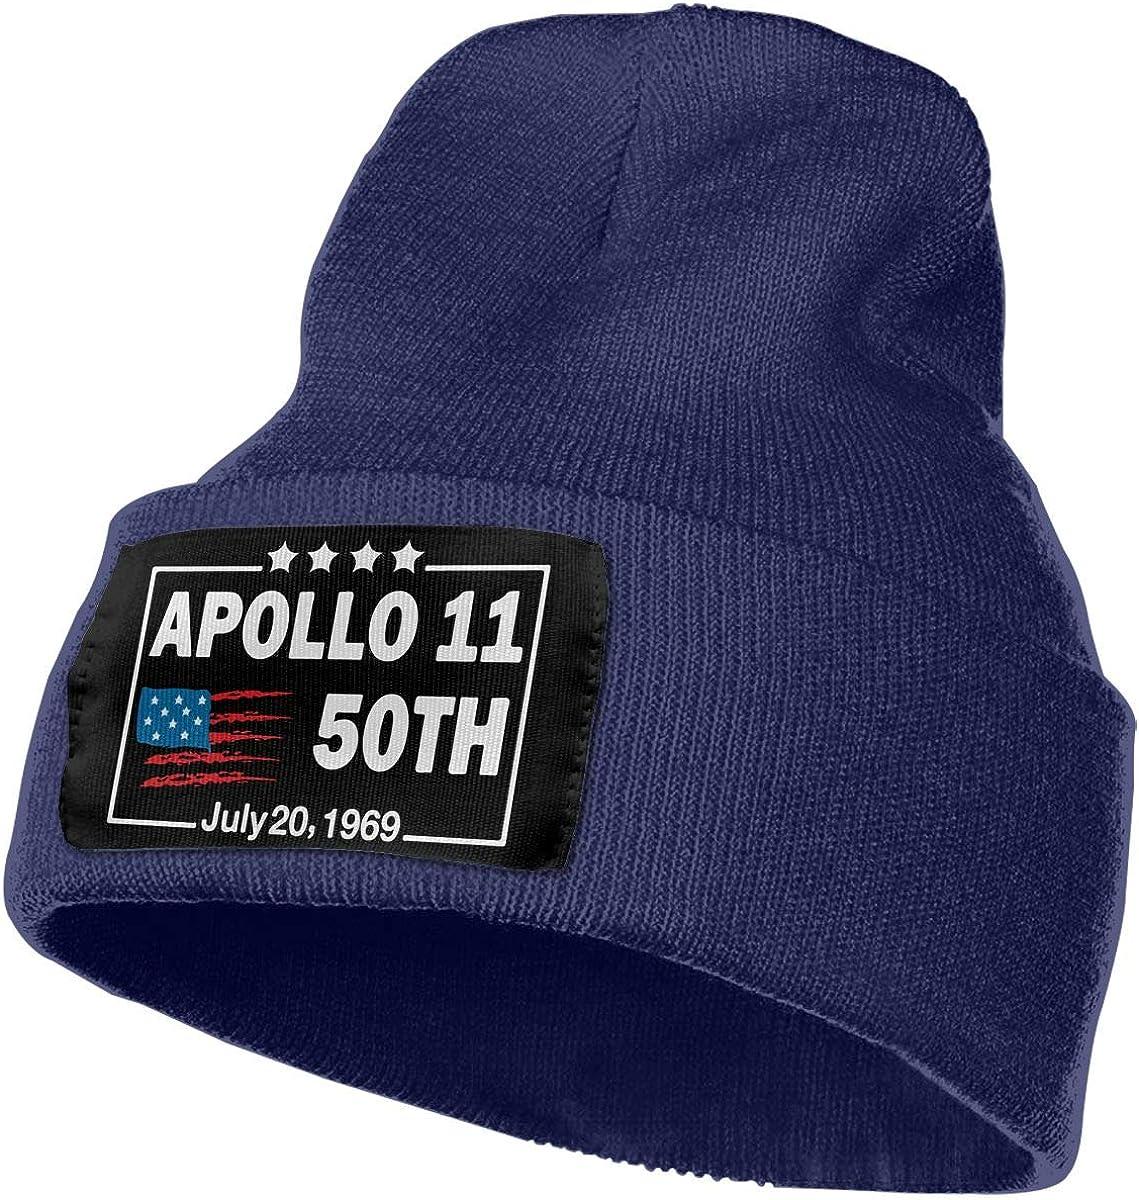 Apollo 11 50th Anniversary Beanie Cap Skull Cap Men Women Winter Warm Knitting Hats